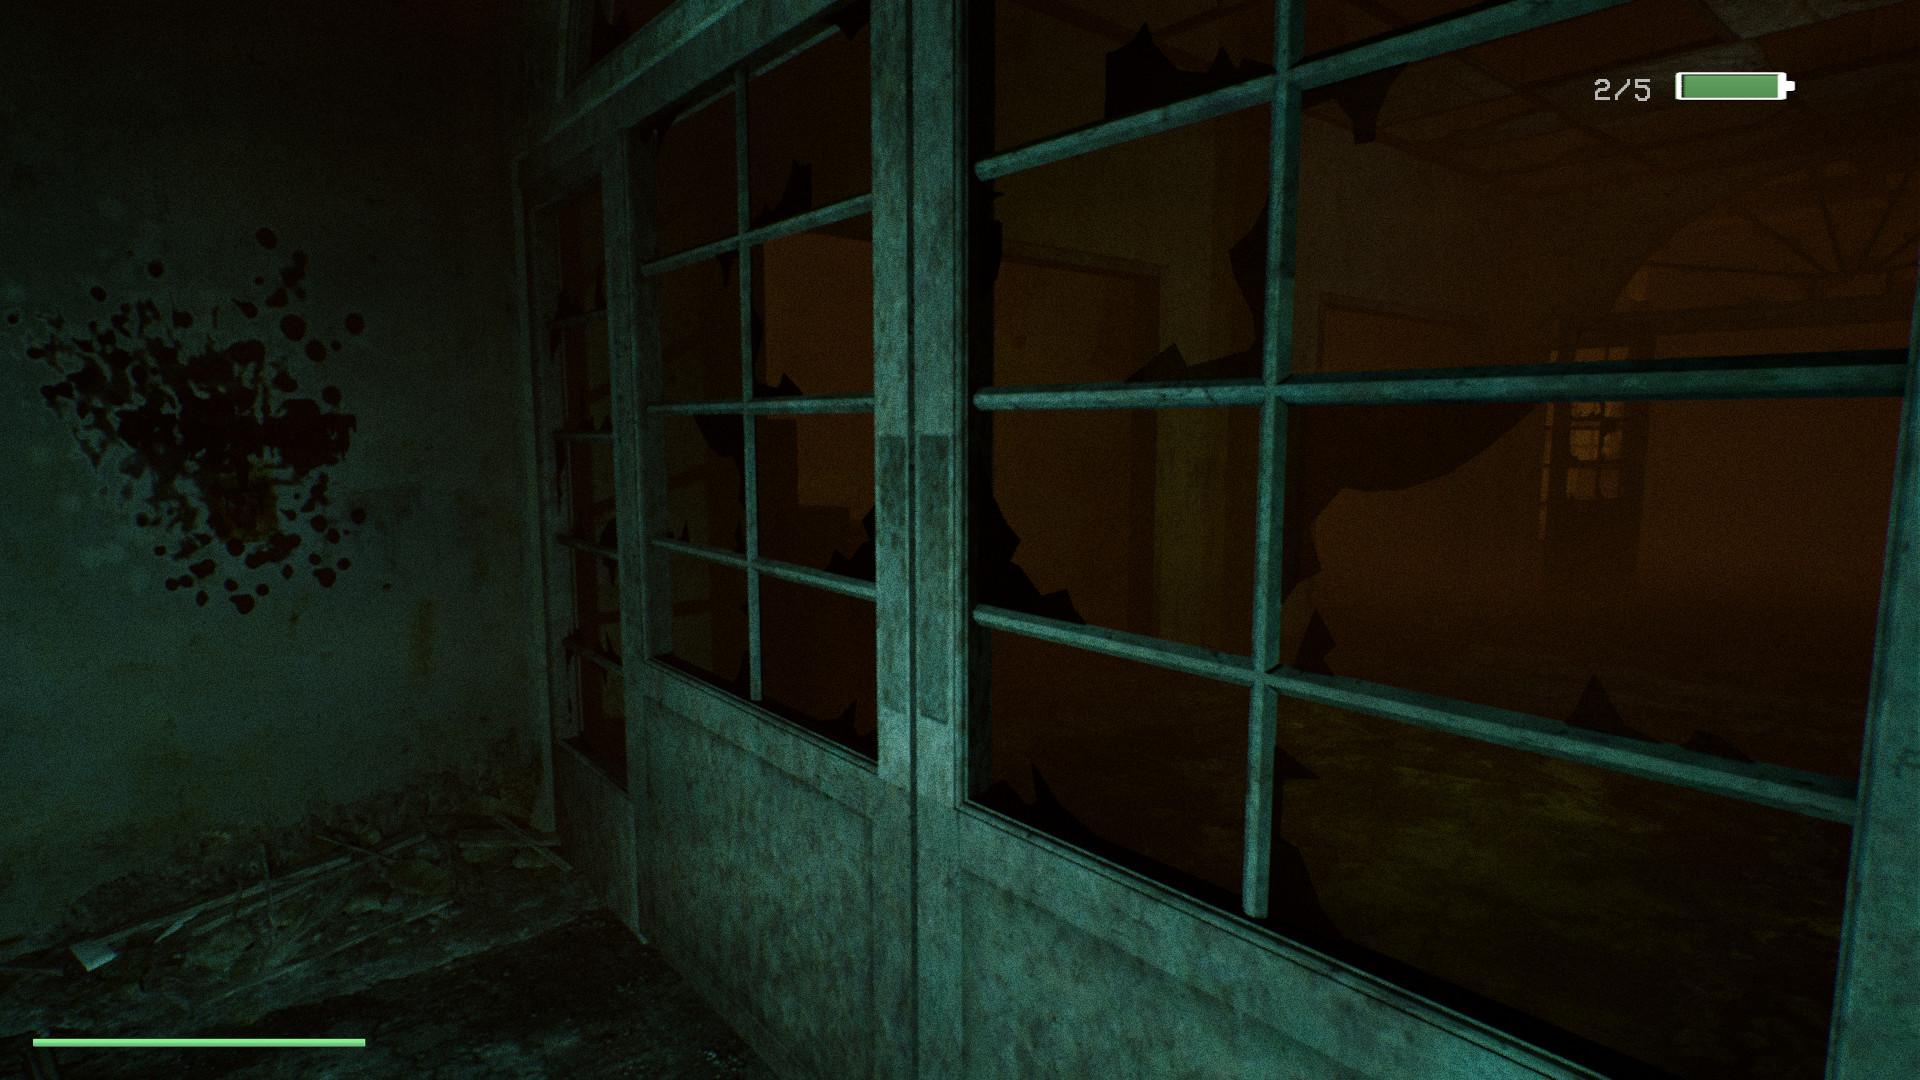 The 8th Day screenshot